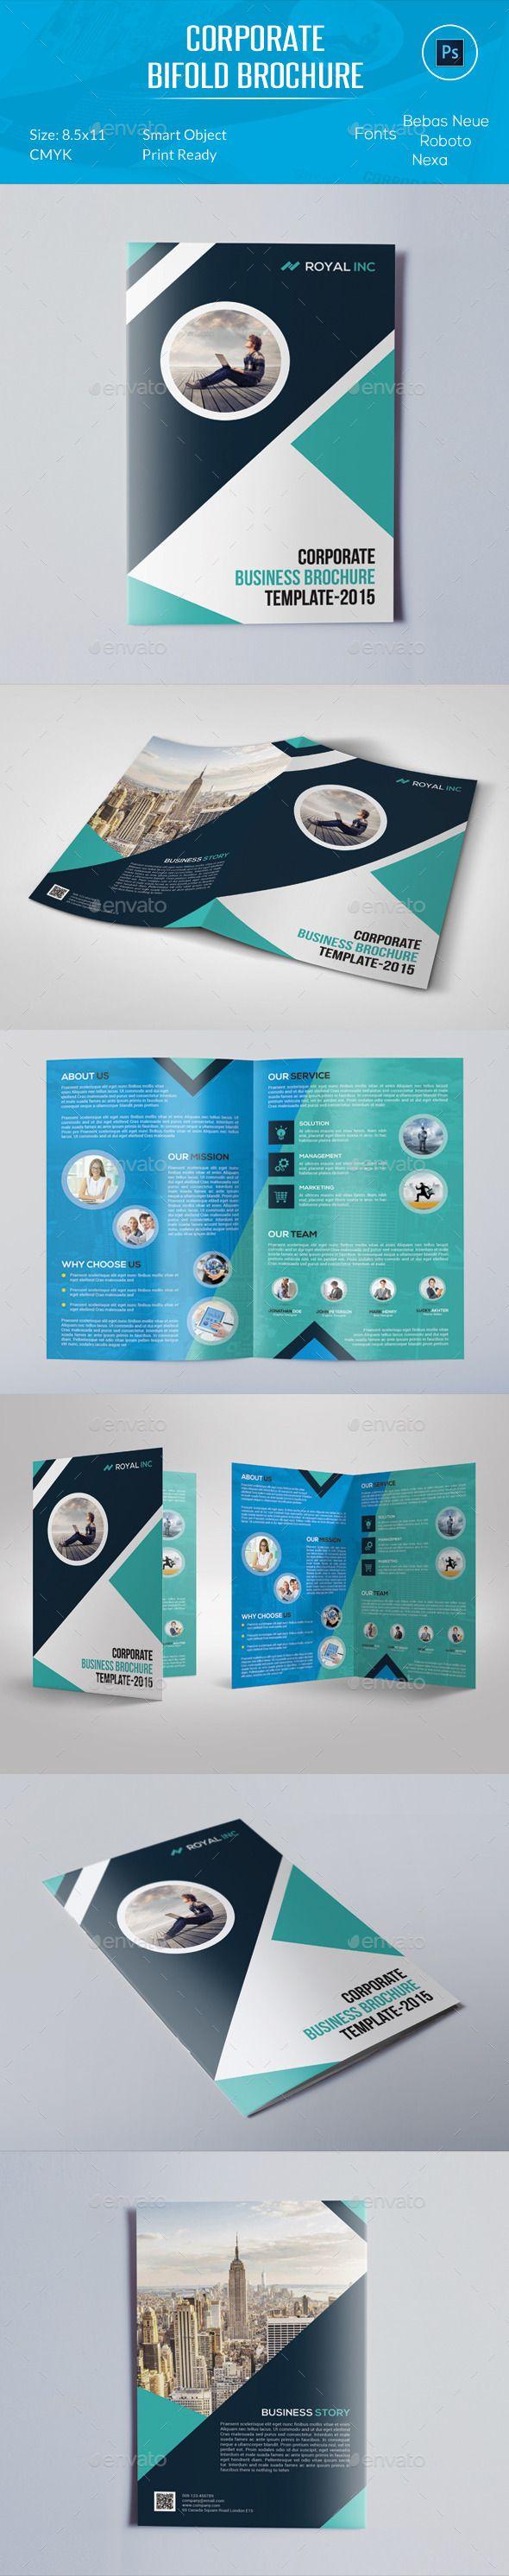 Corporate Bifold Brochure Template #design Download: http://graphicriver.net/item/corporate-bifold-brochure/12248523?ref=ksioks